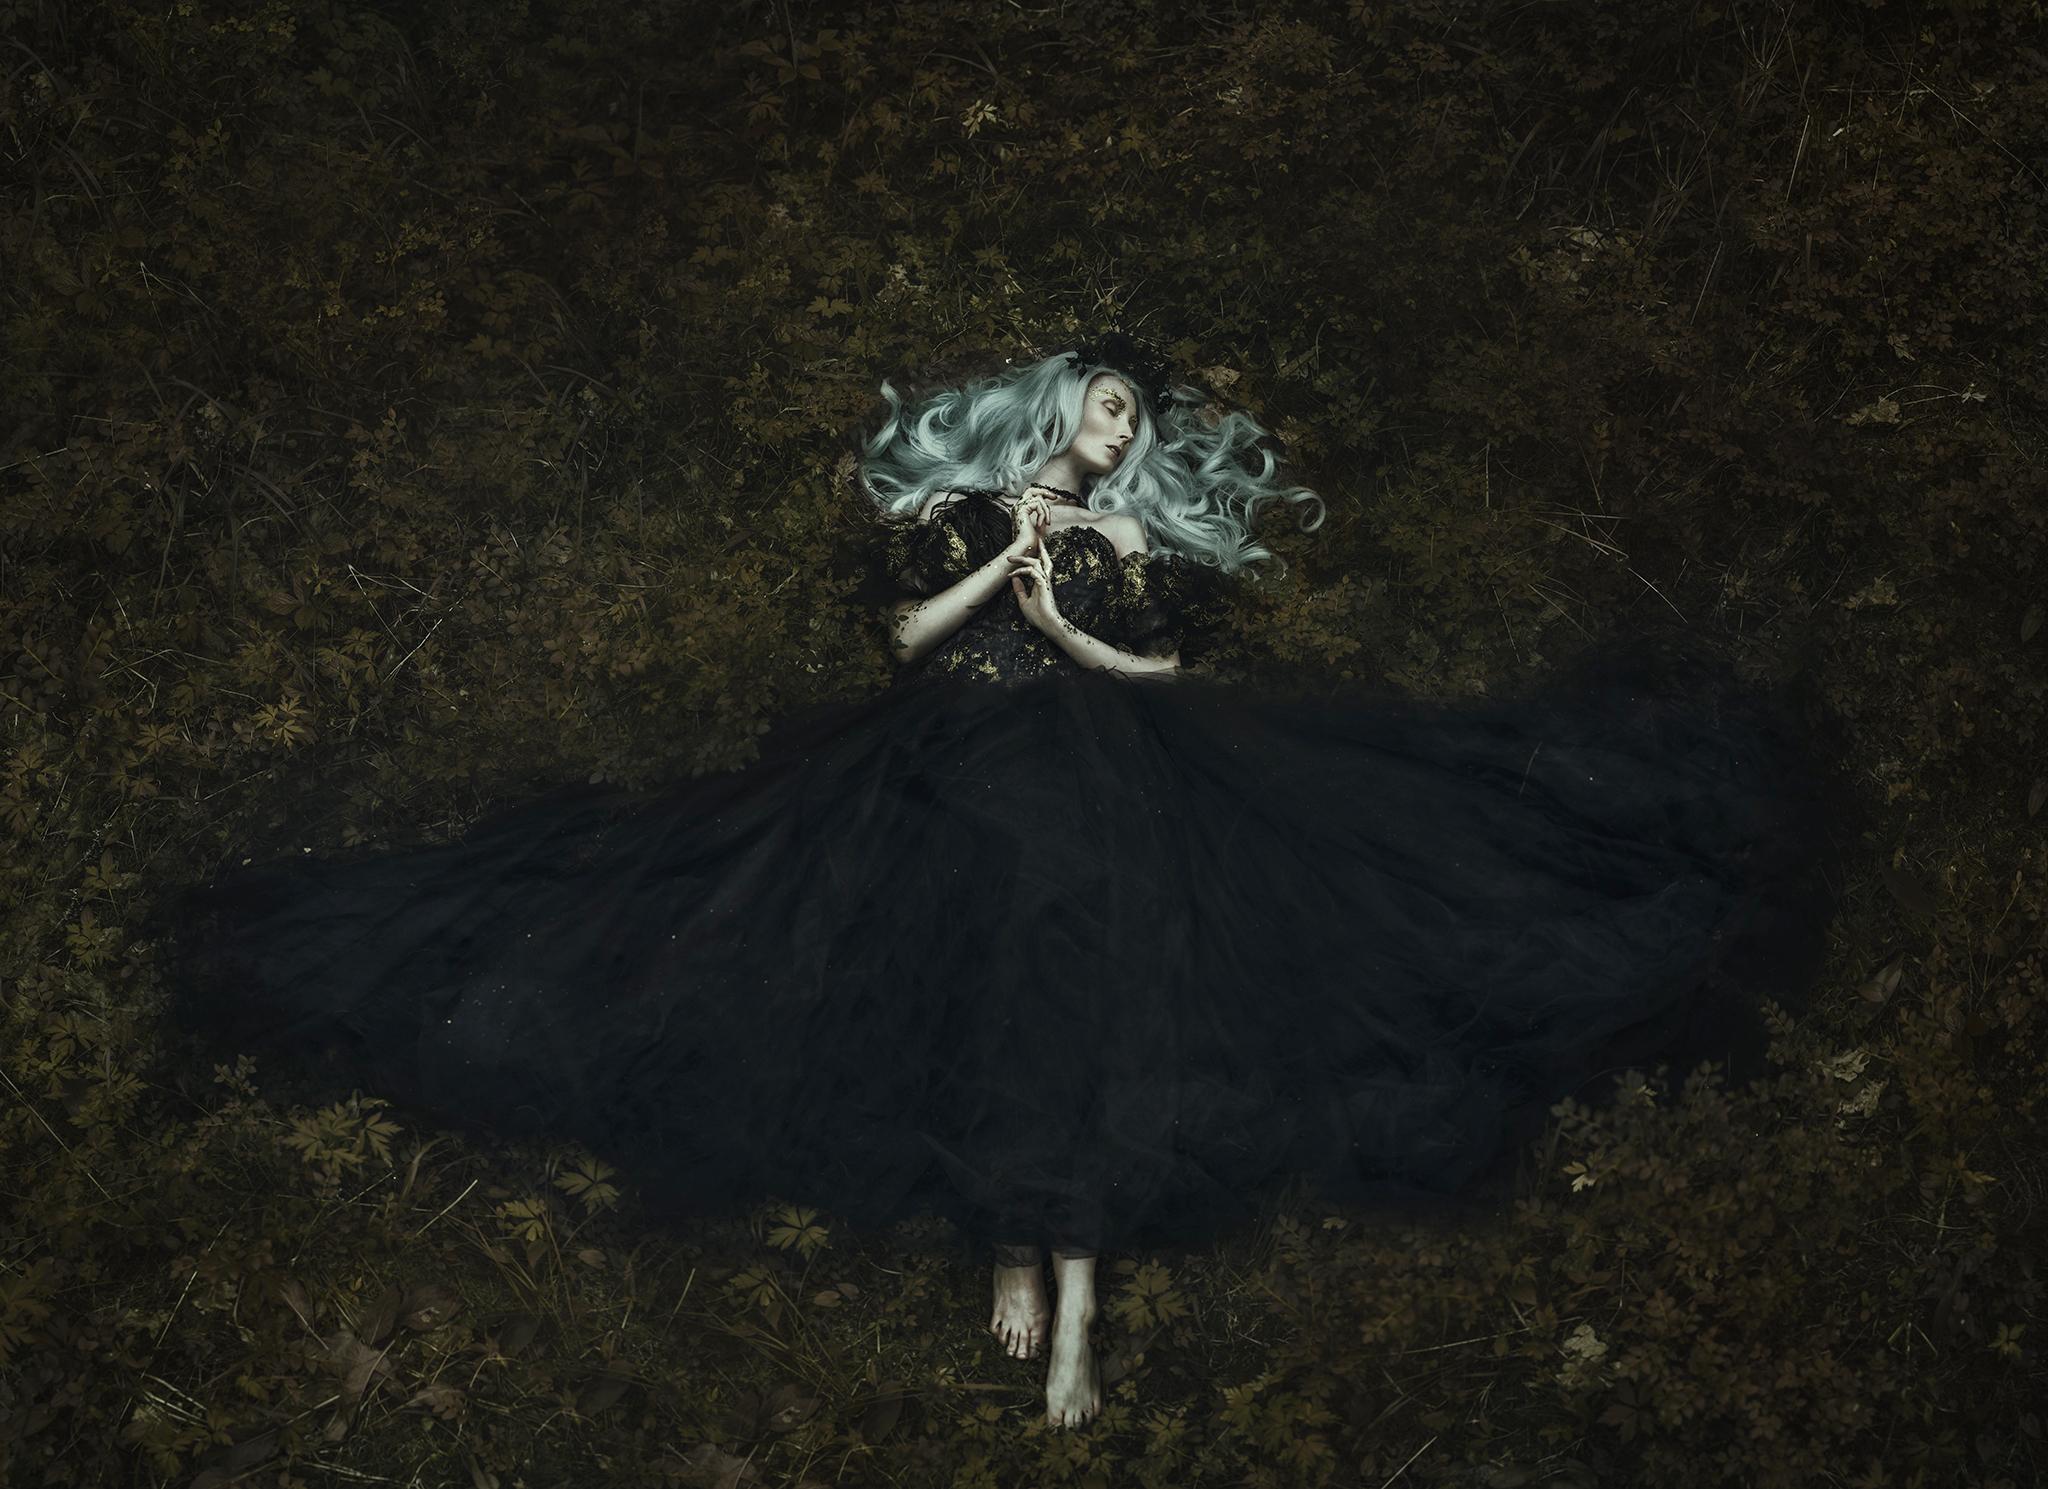 3970-fineart-creature-forest-morkcollective-mikaela-holmberg-mirjam-lehtonen-2.jpg